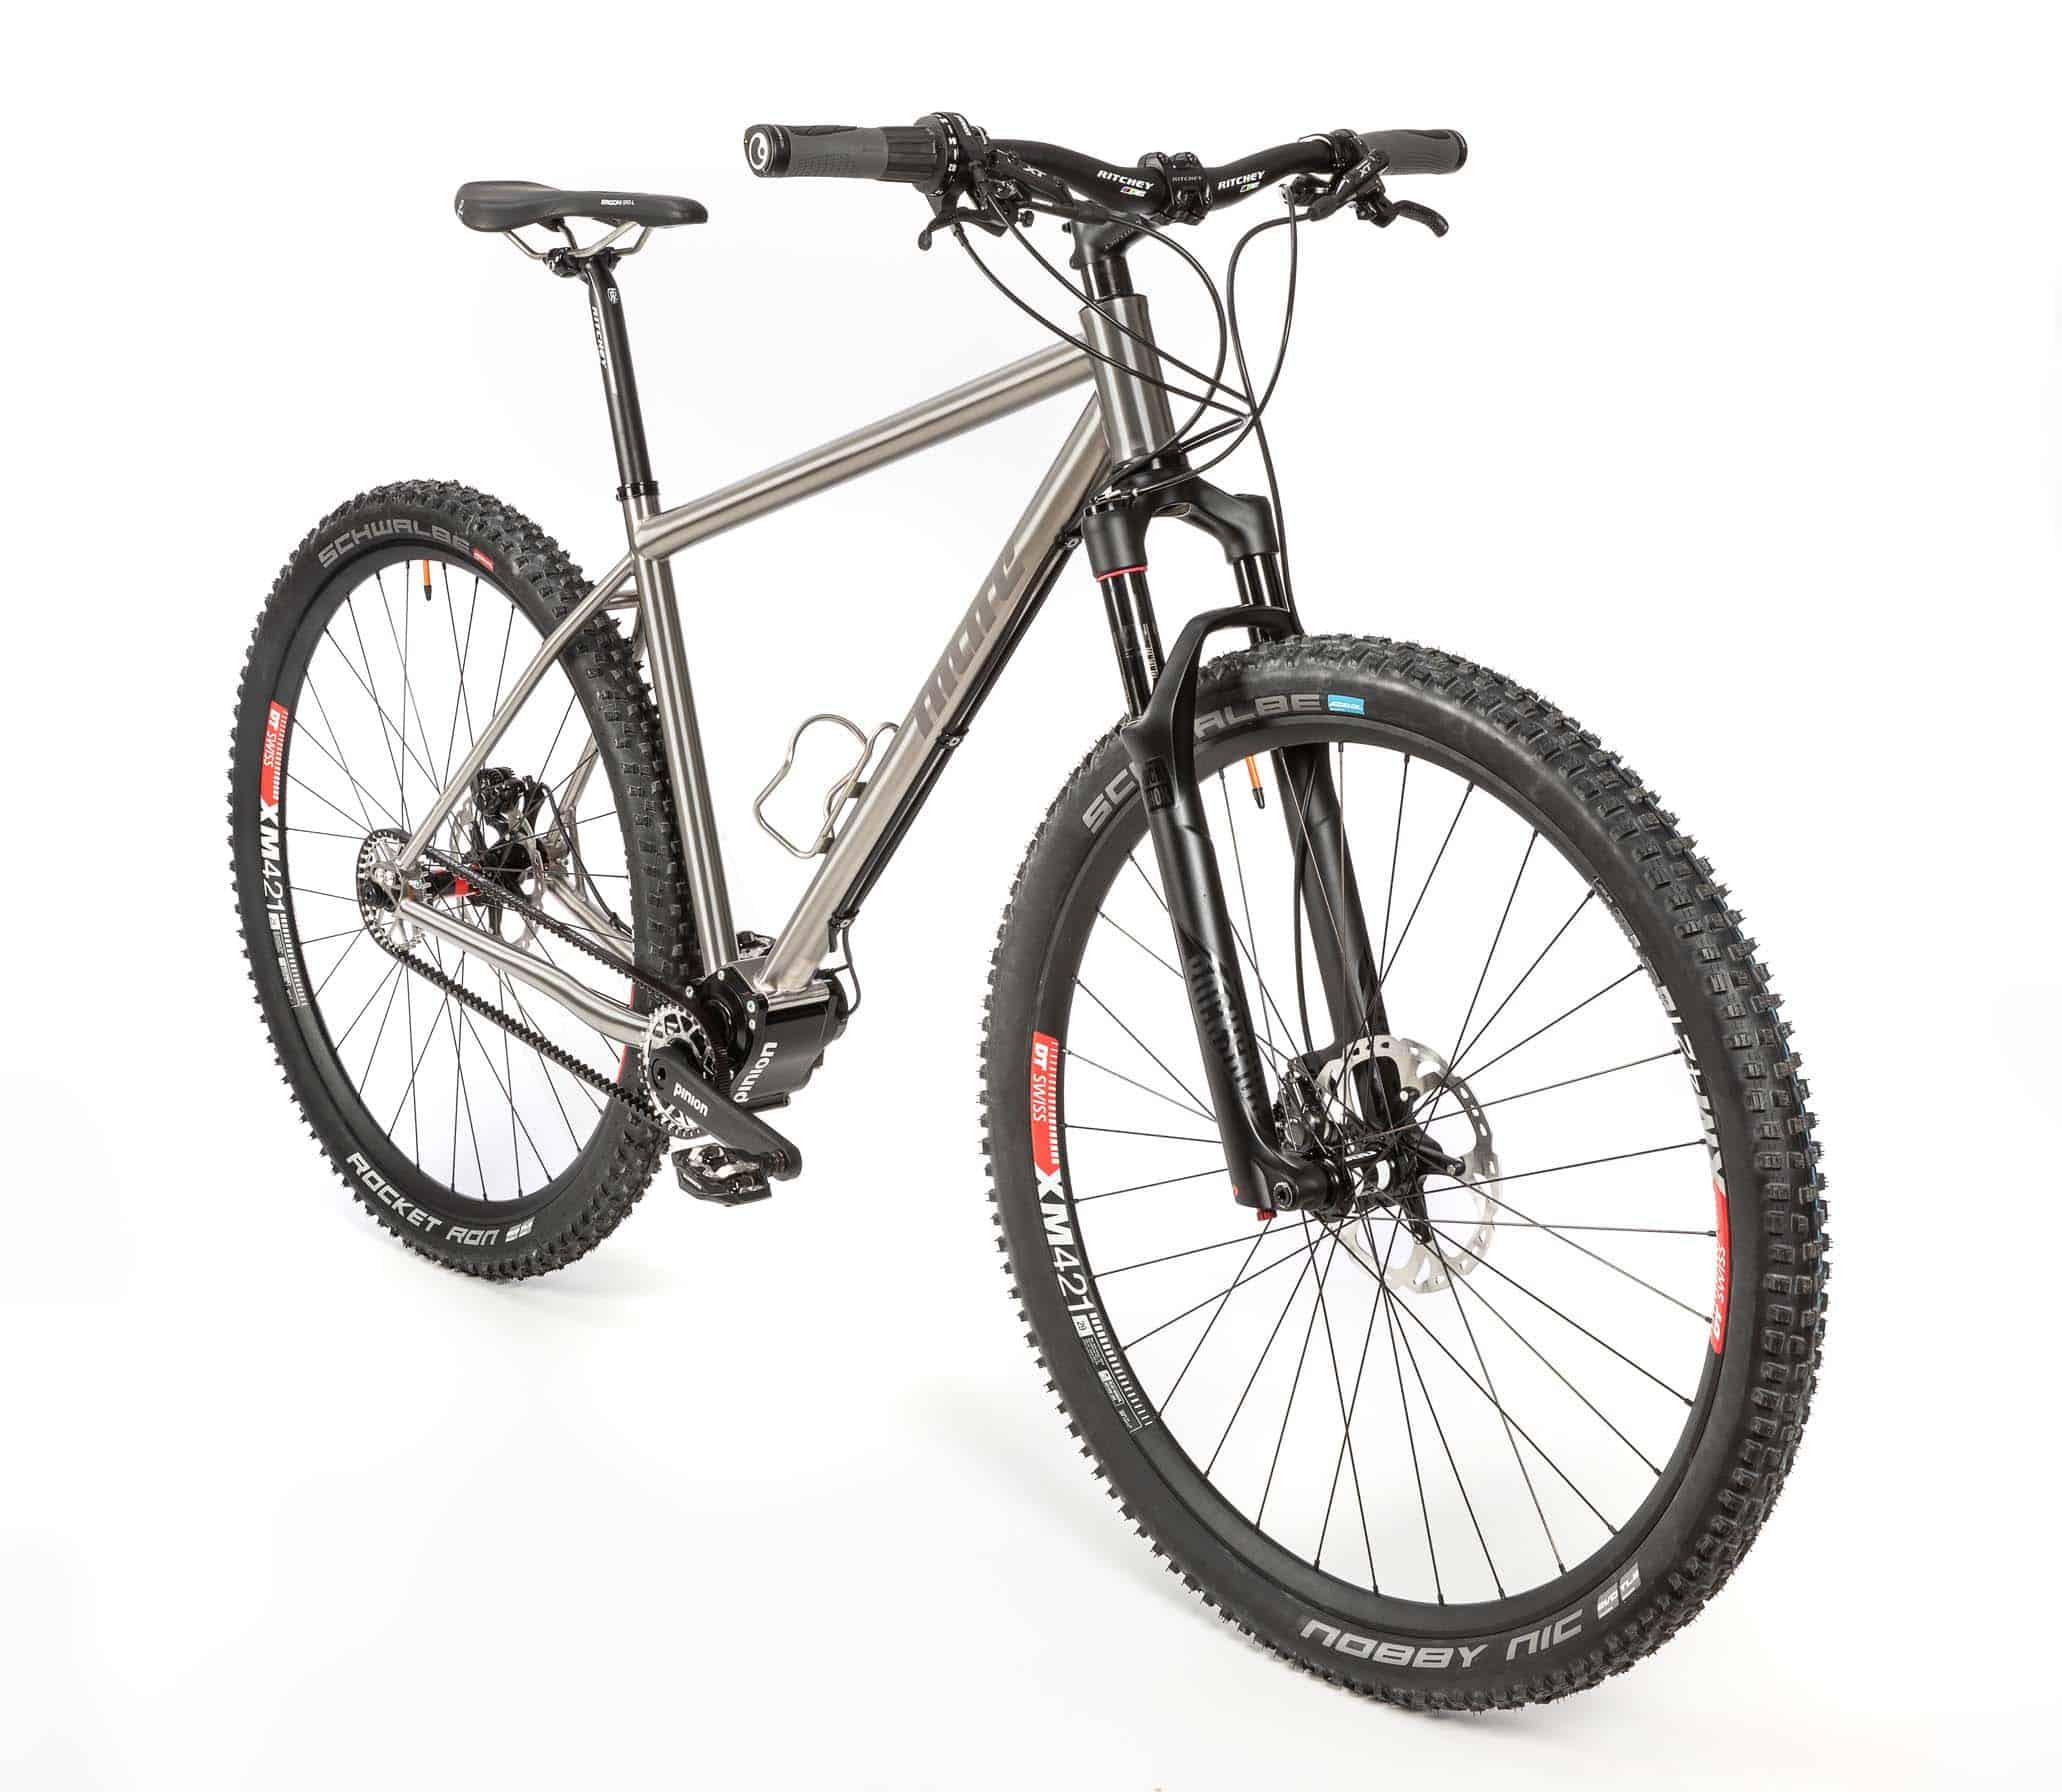 Pinion_Titan_MTB_Mountainbike_12